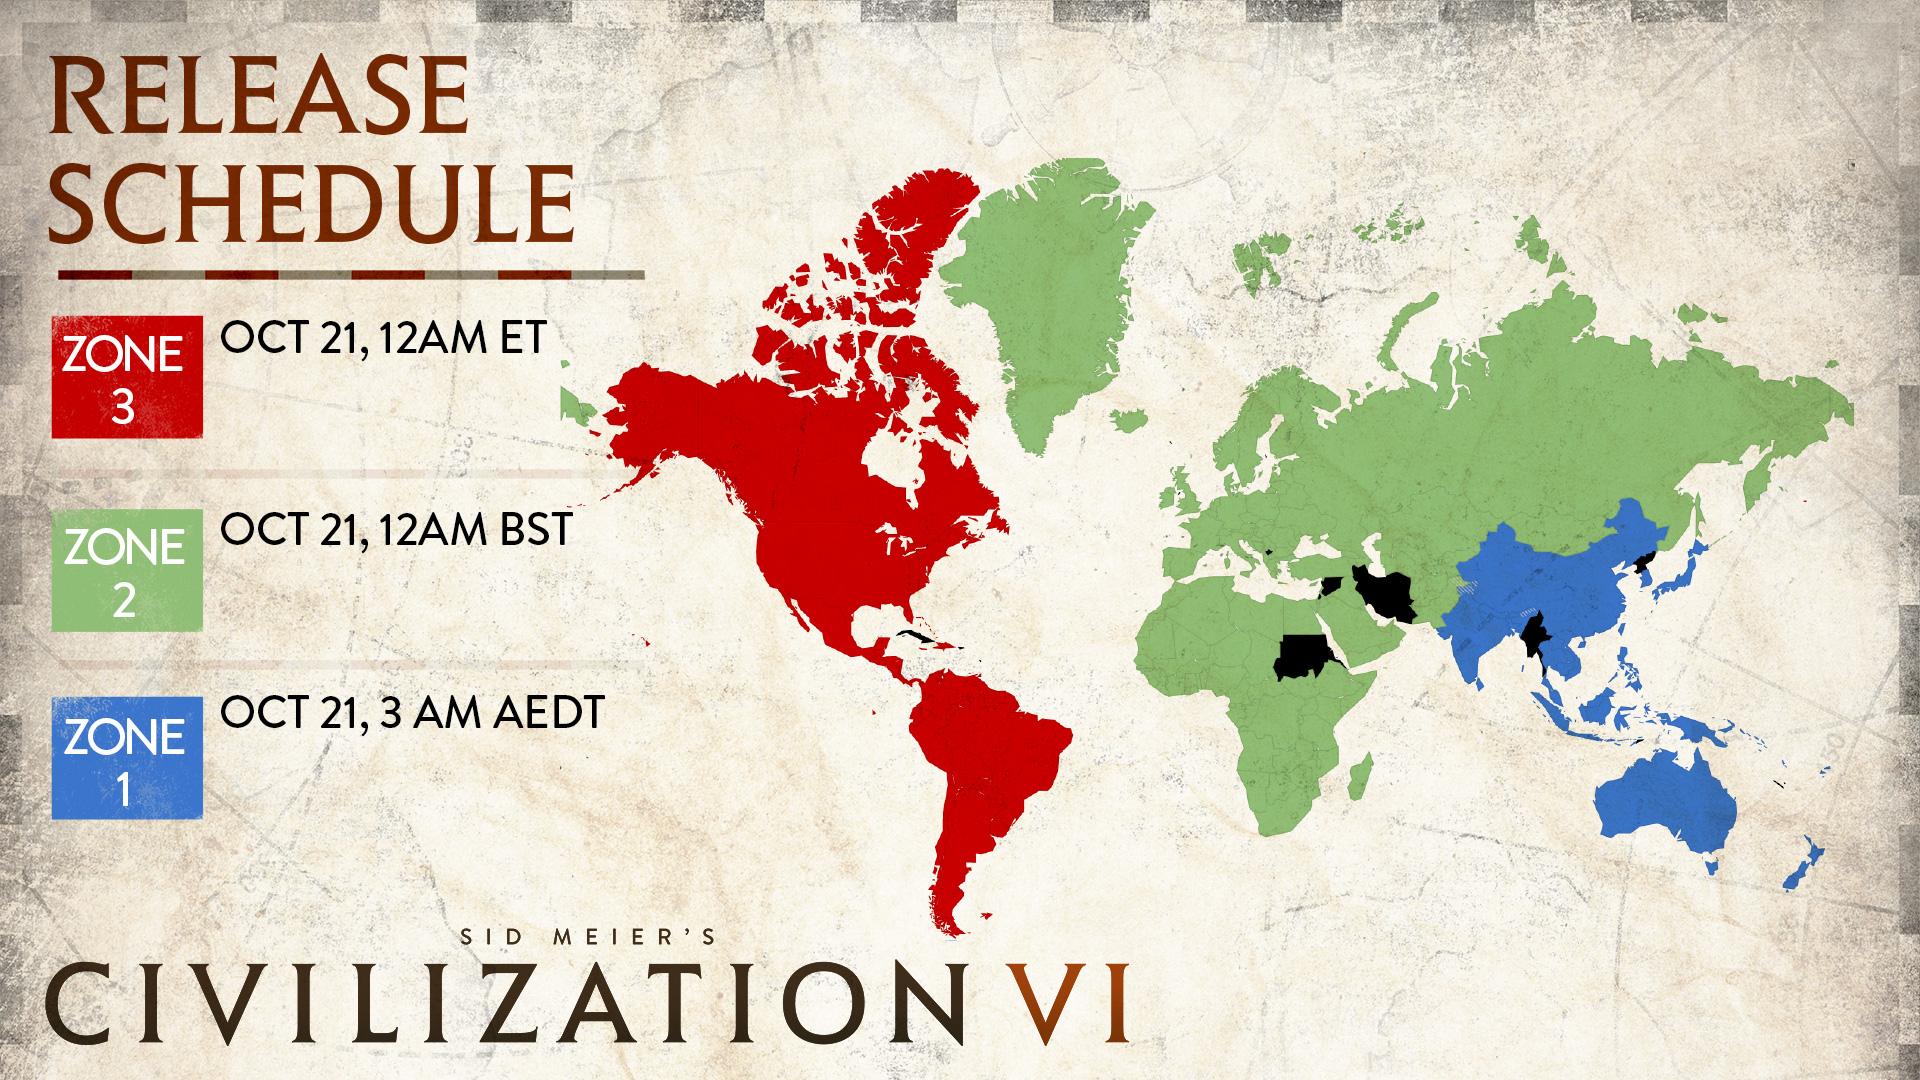 Civ 6 Unlock Times Map